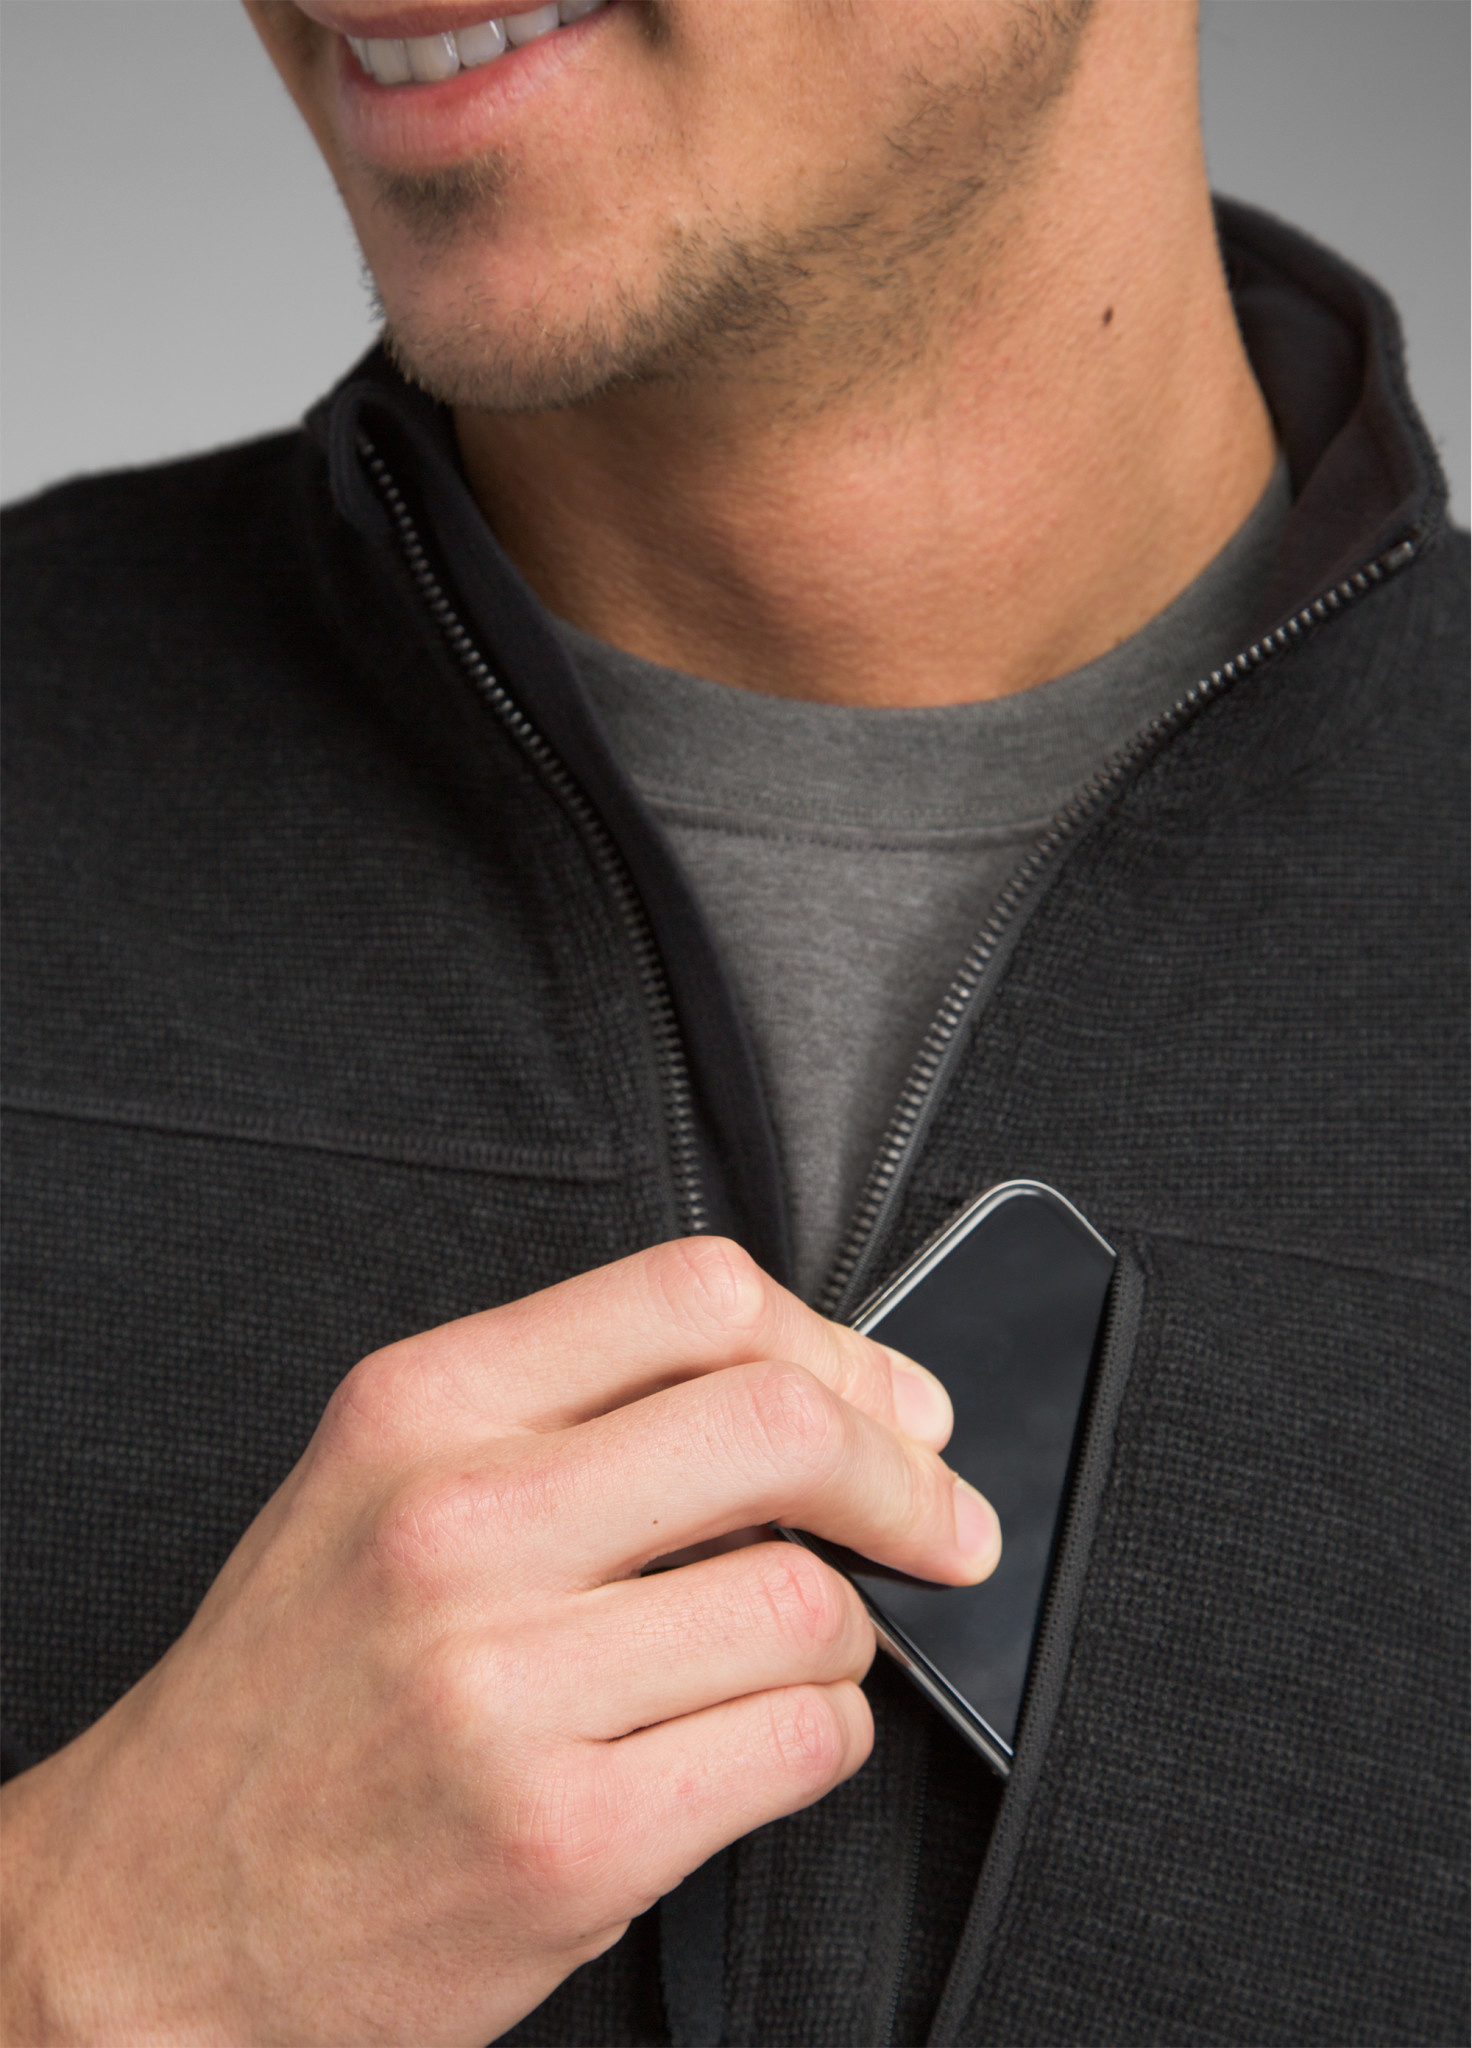 prAna Riddle Full Zip Pullover Black